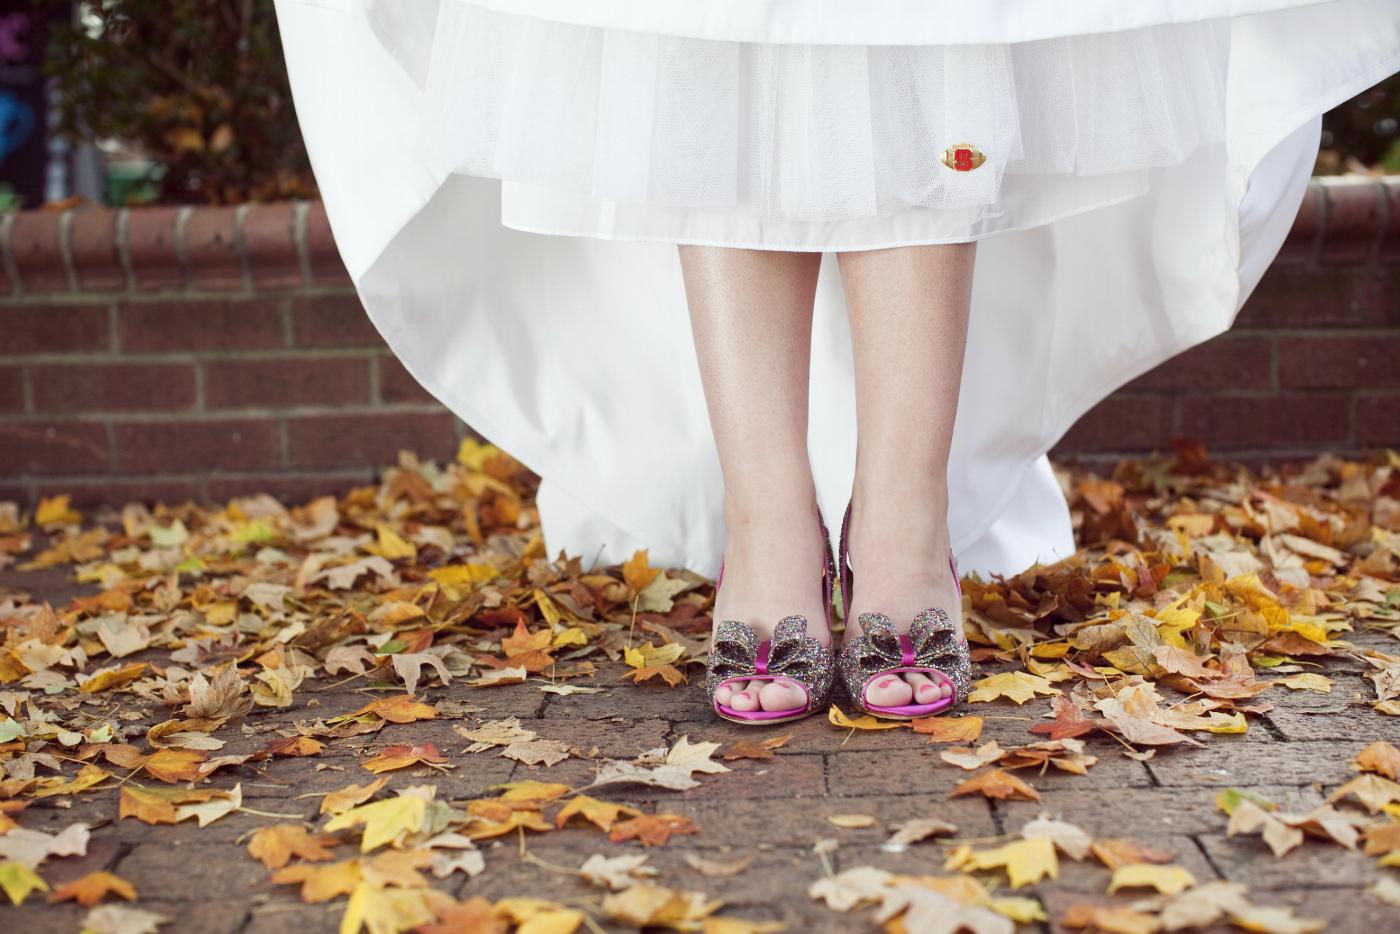 wedding shoe purchase kate spade charm kate spade wedding shoes Wedding shoe purchase Kate Spade Charm in multi glitter